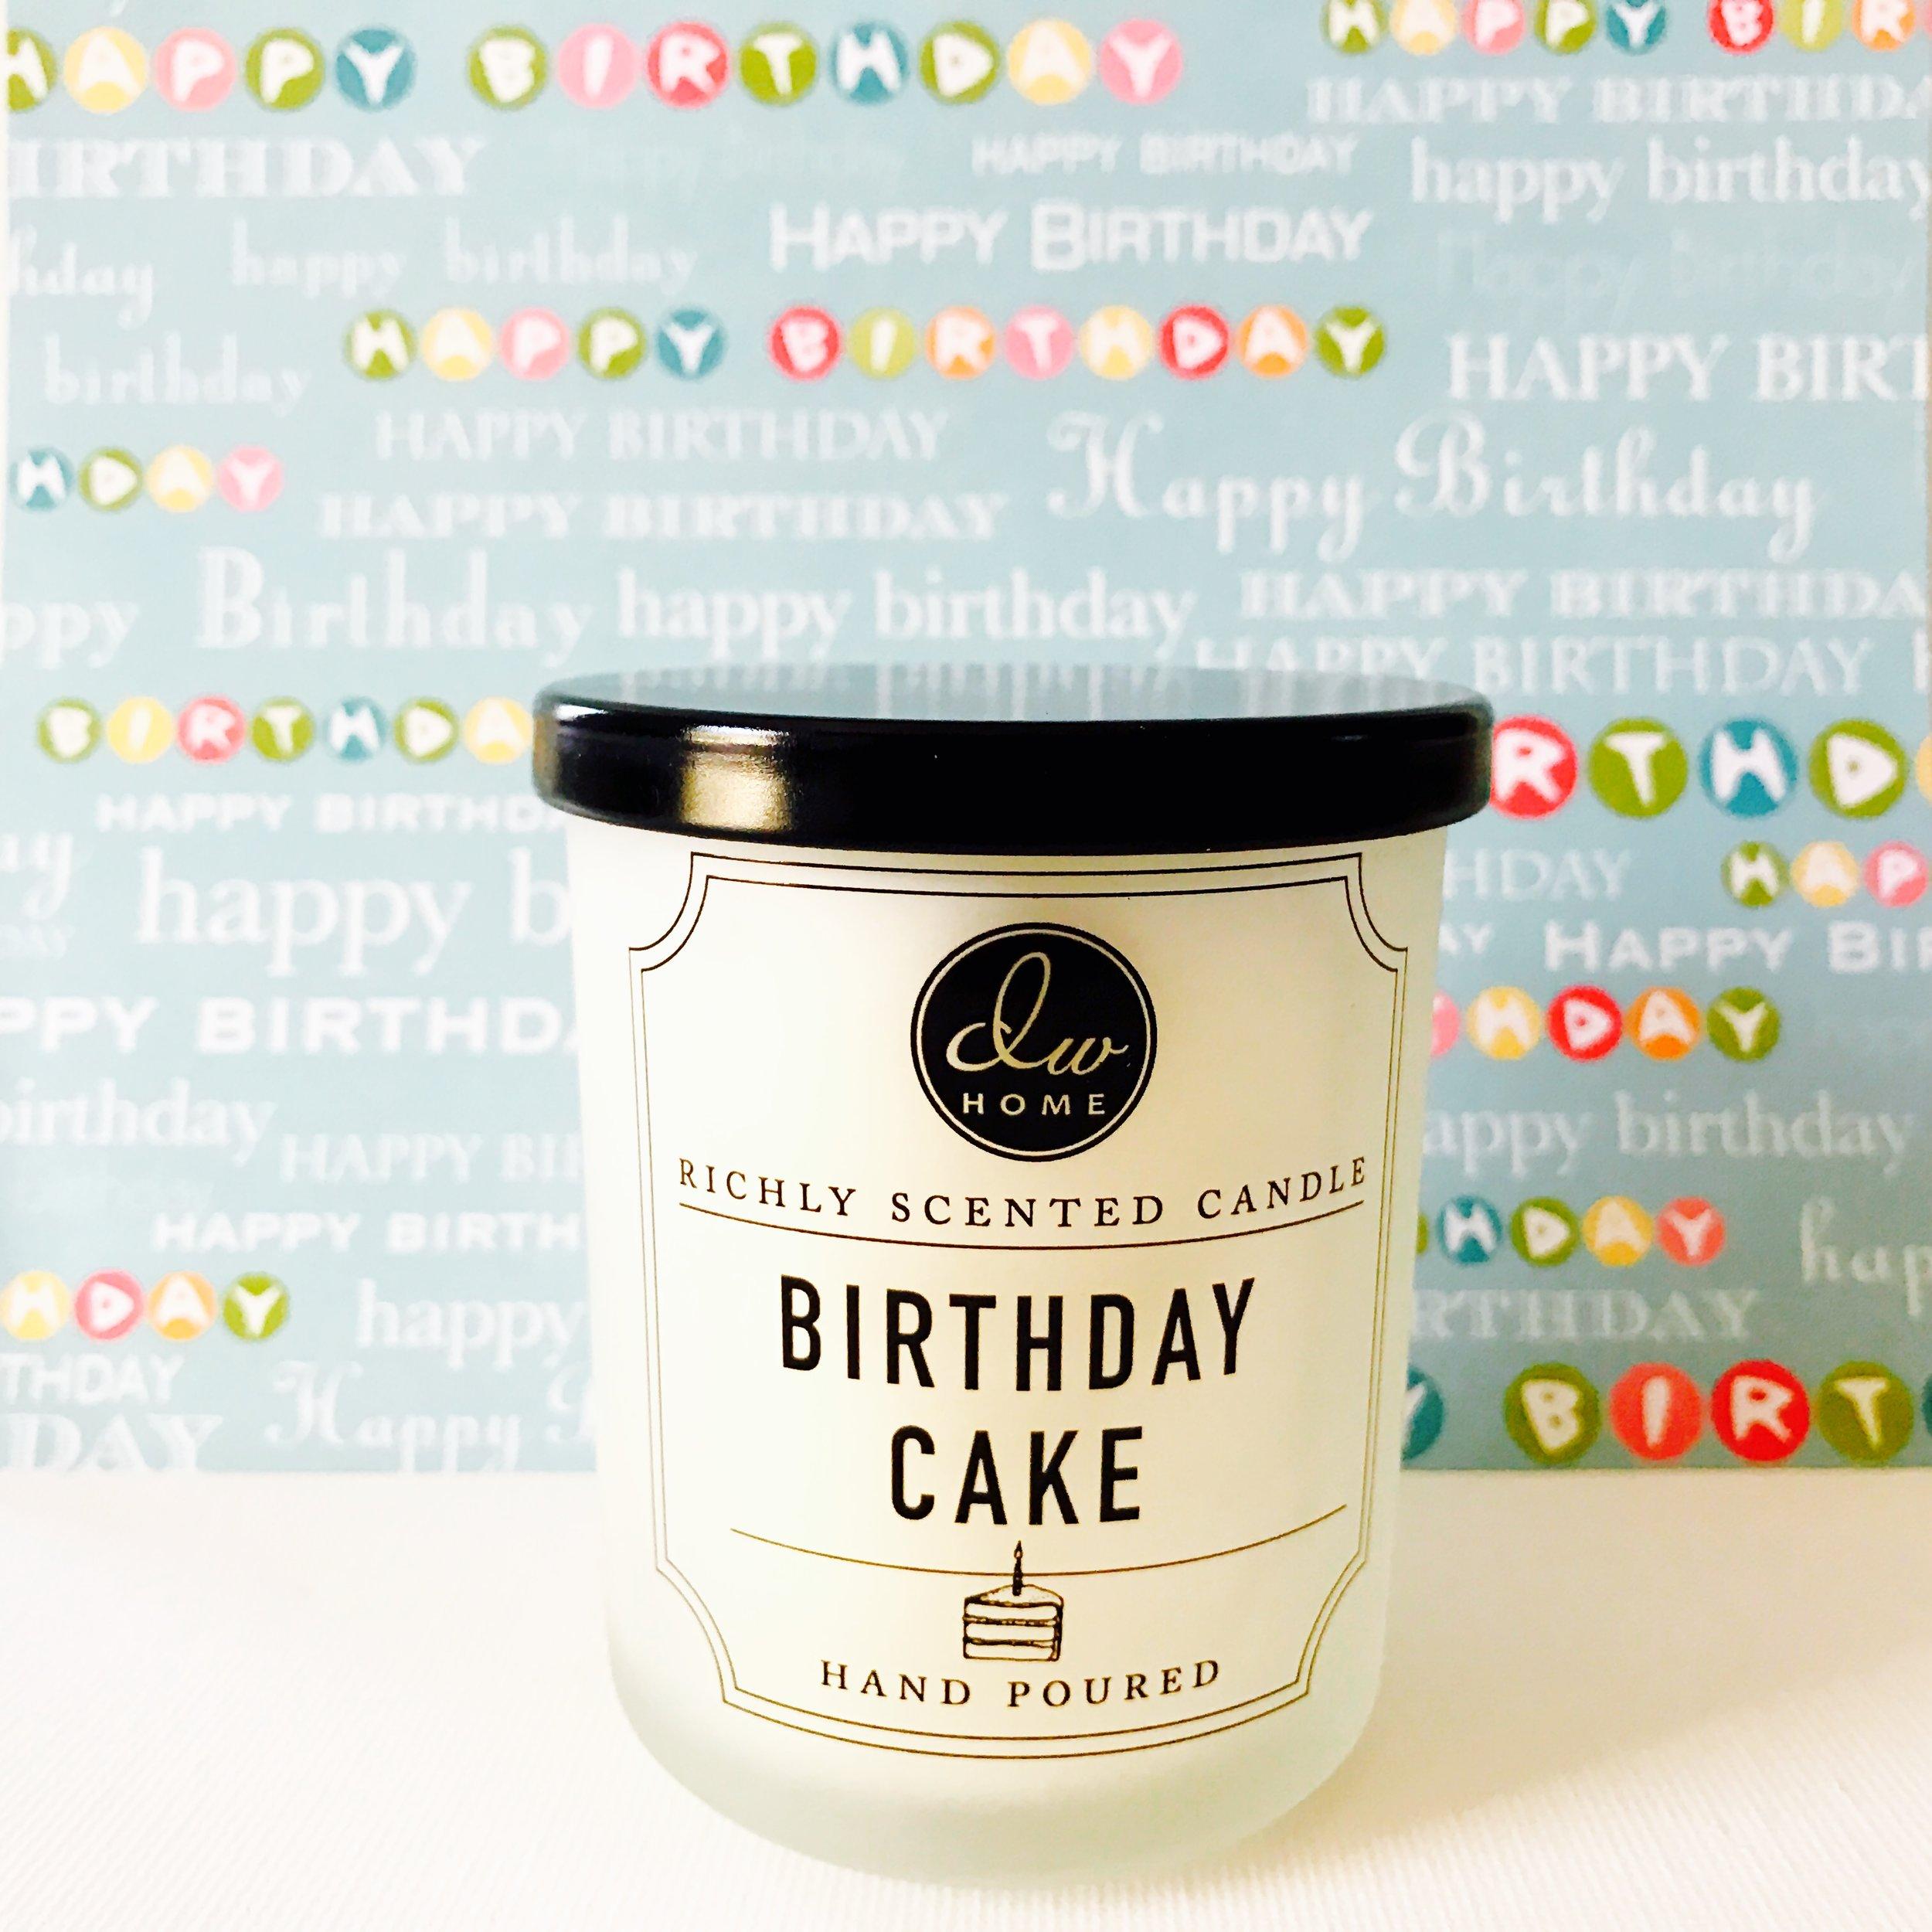 BIRTHDAY CAKE IN A JAR.